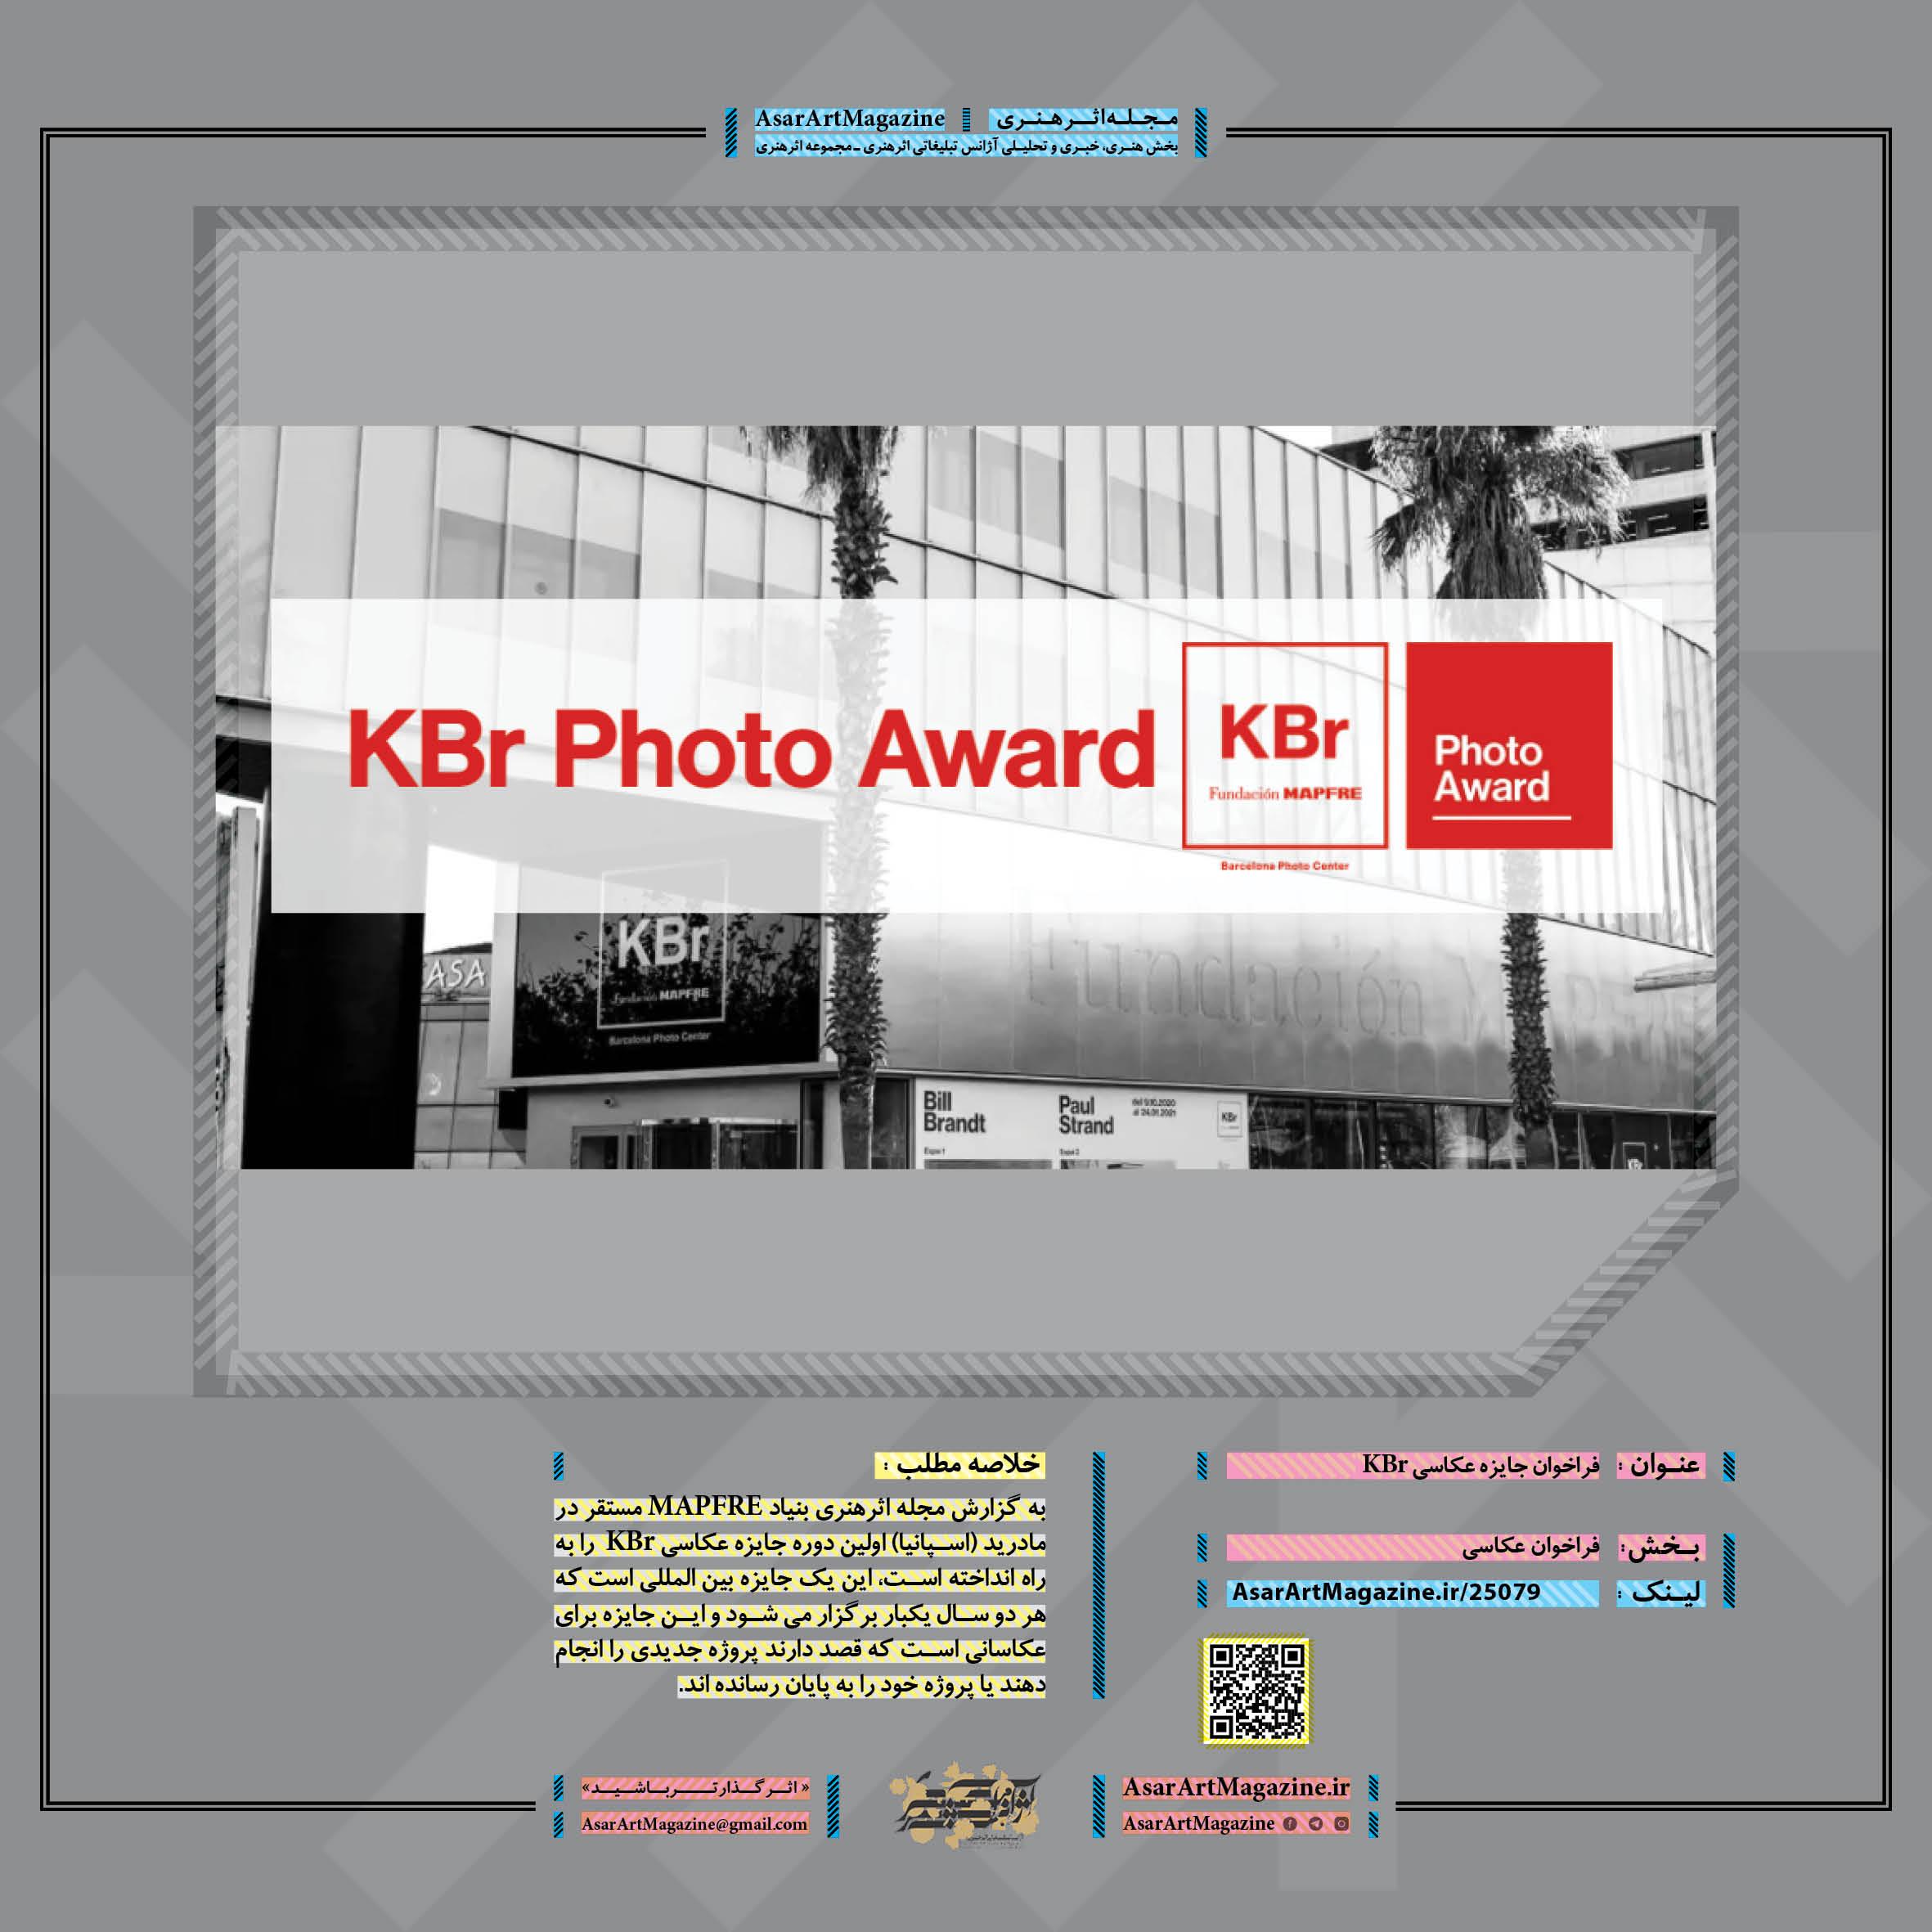 فراخوان جایزه عکاسی KBr  مجله اثرهنری ـ اثر هنری